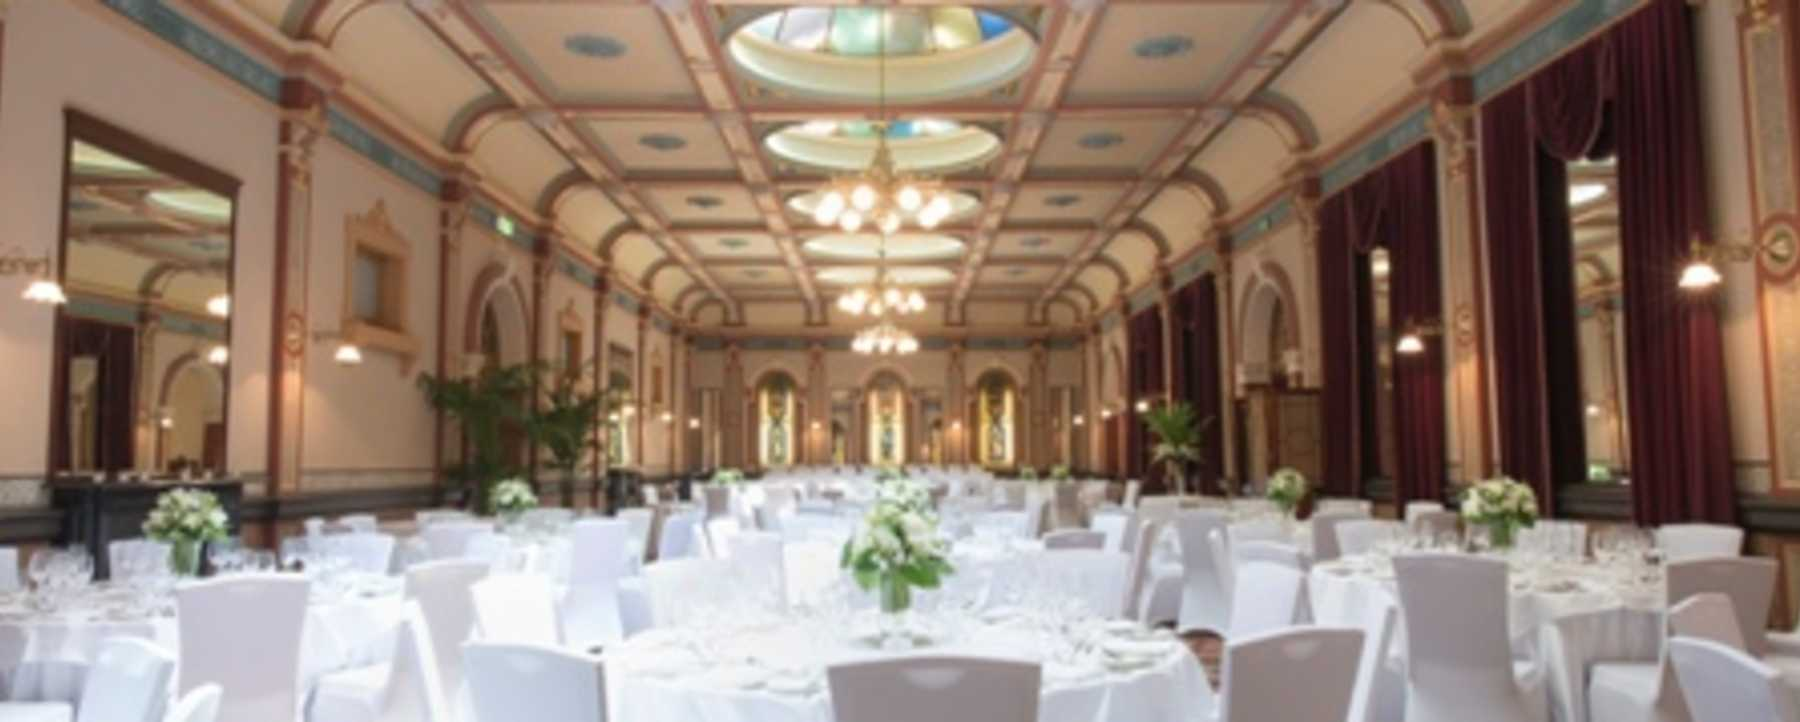 The Hotel Windsor - Grand Ballroom